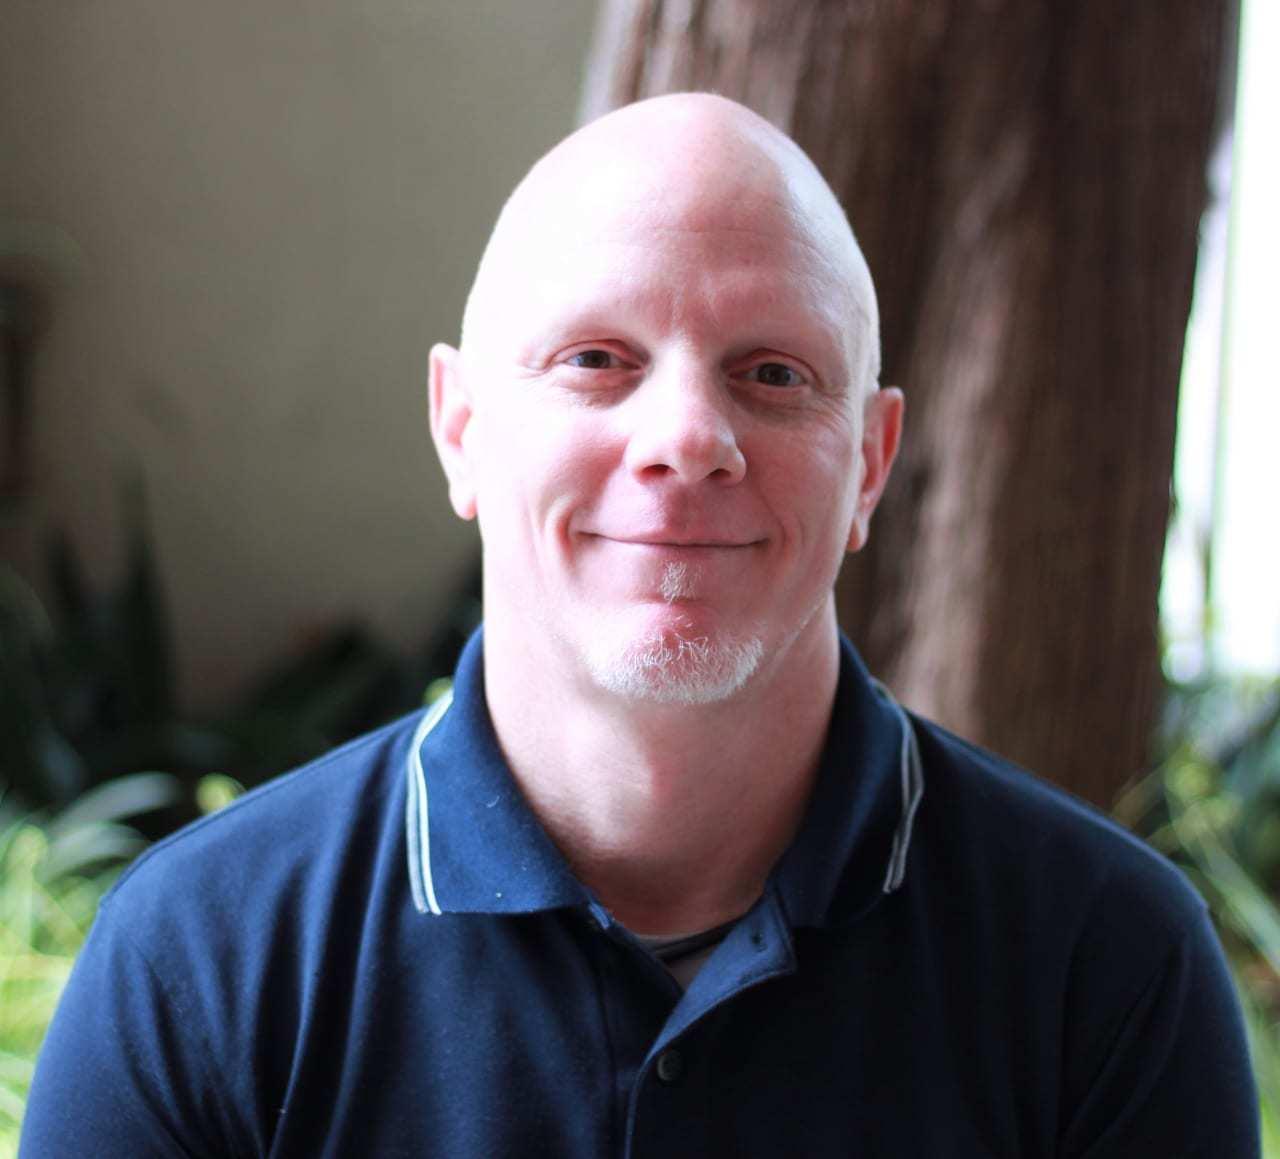 Dwayne Primeau - Vice Principle (primary), Primary Years Programme Coordinator